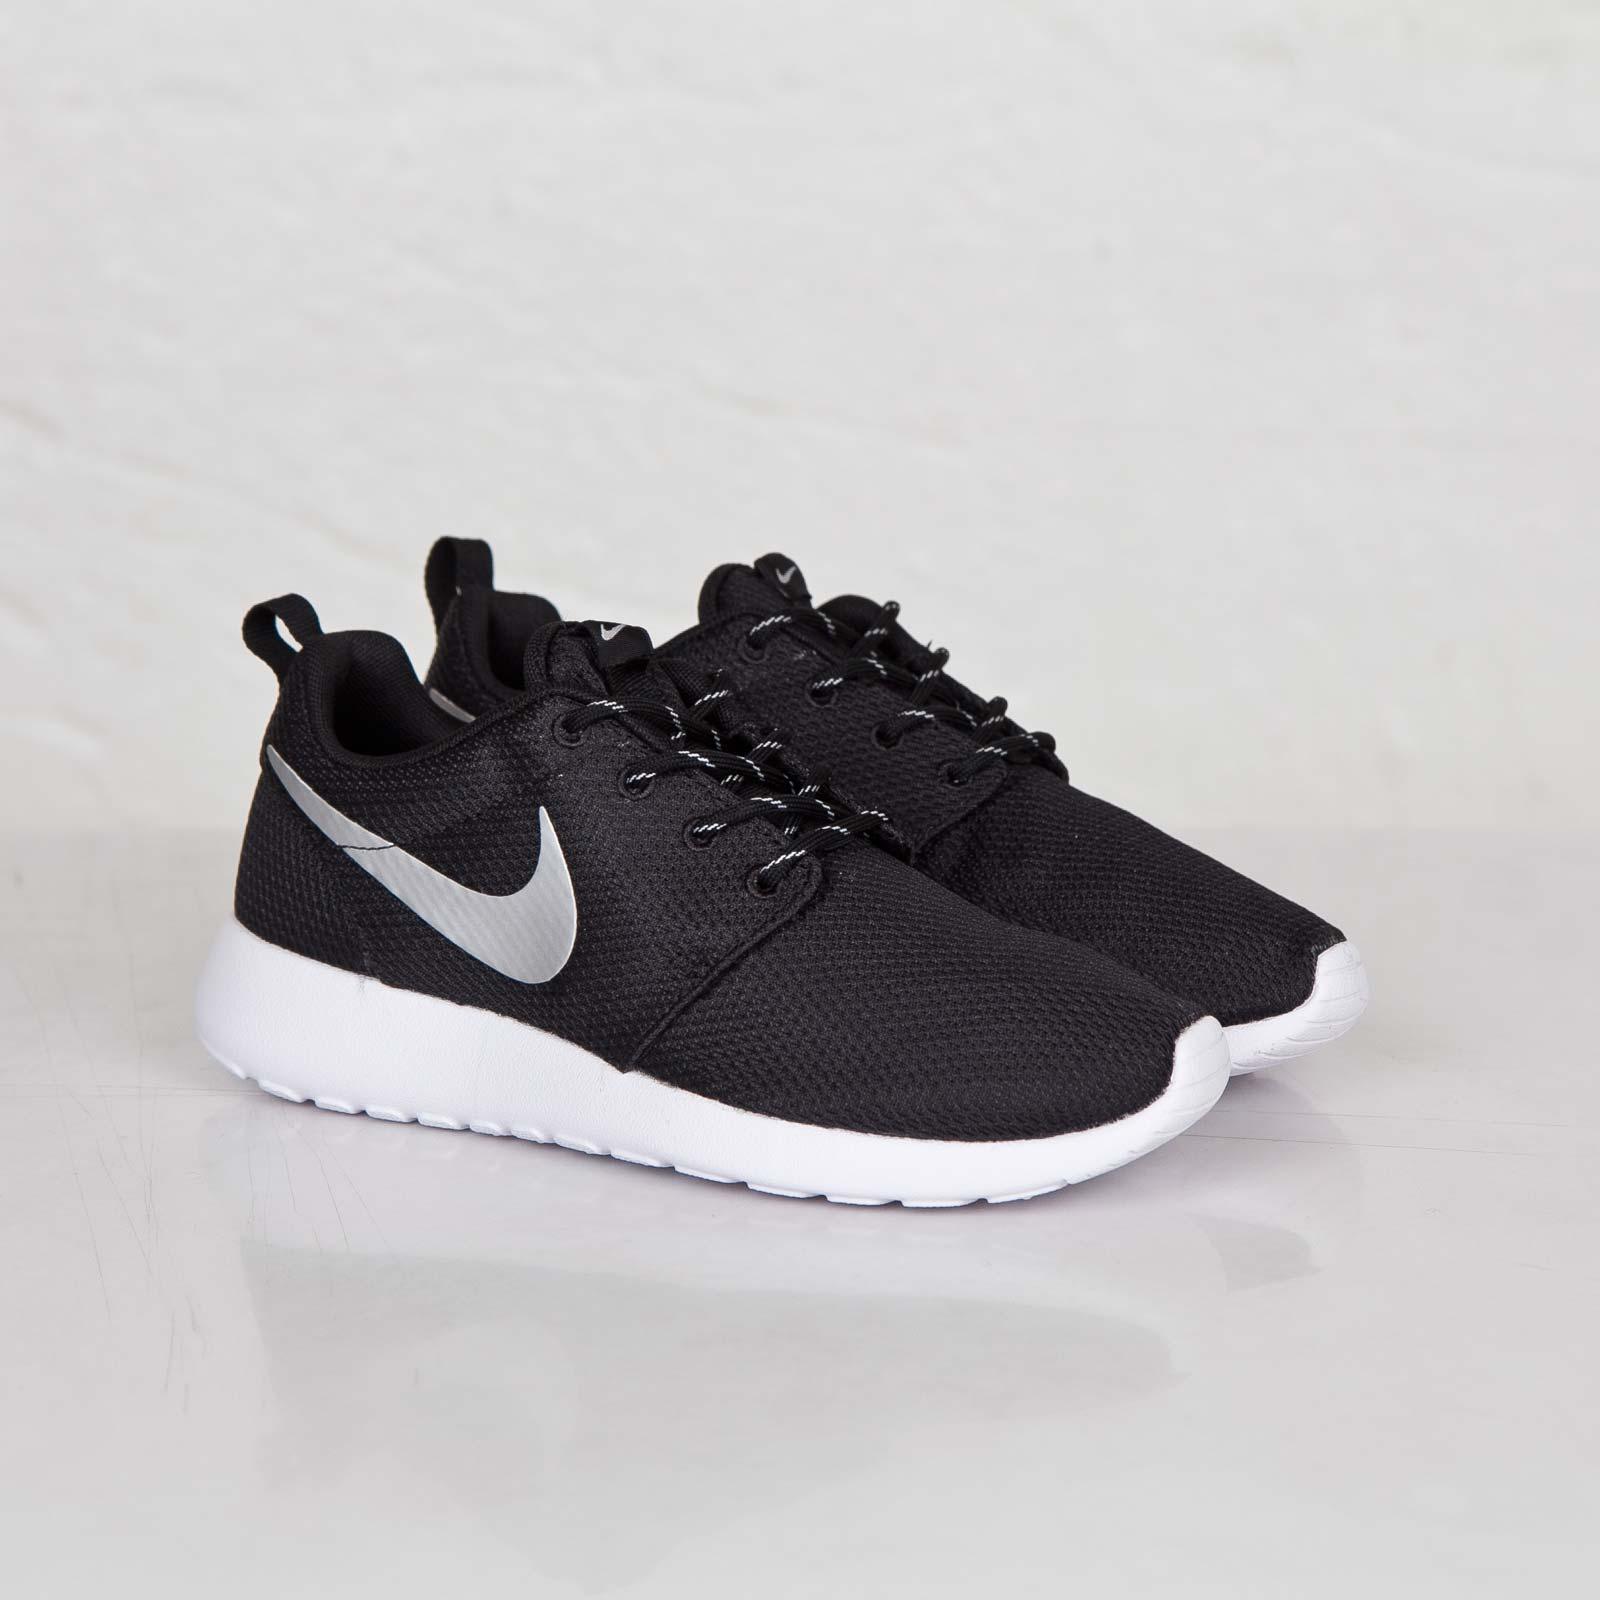 5381ce479606 Nike Wmns Roshe Run - 511882-094 - Sneakersnstuff